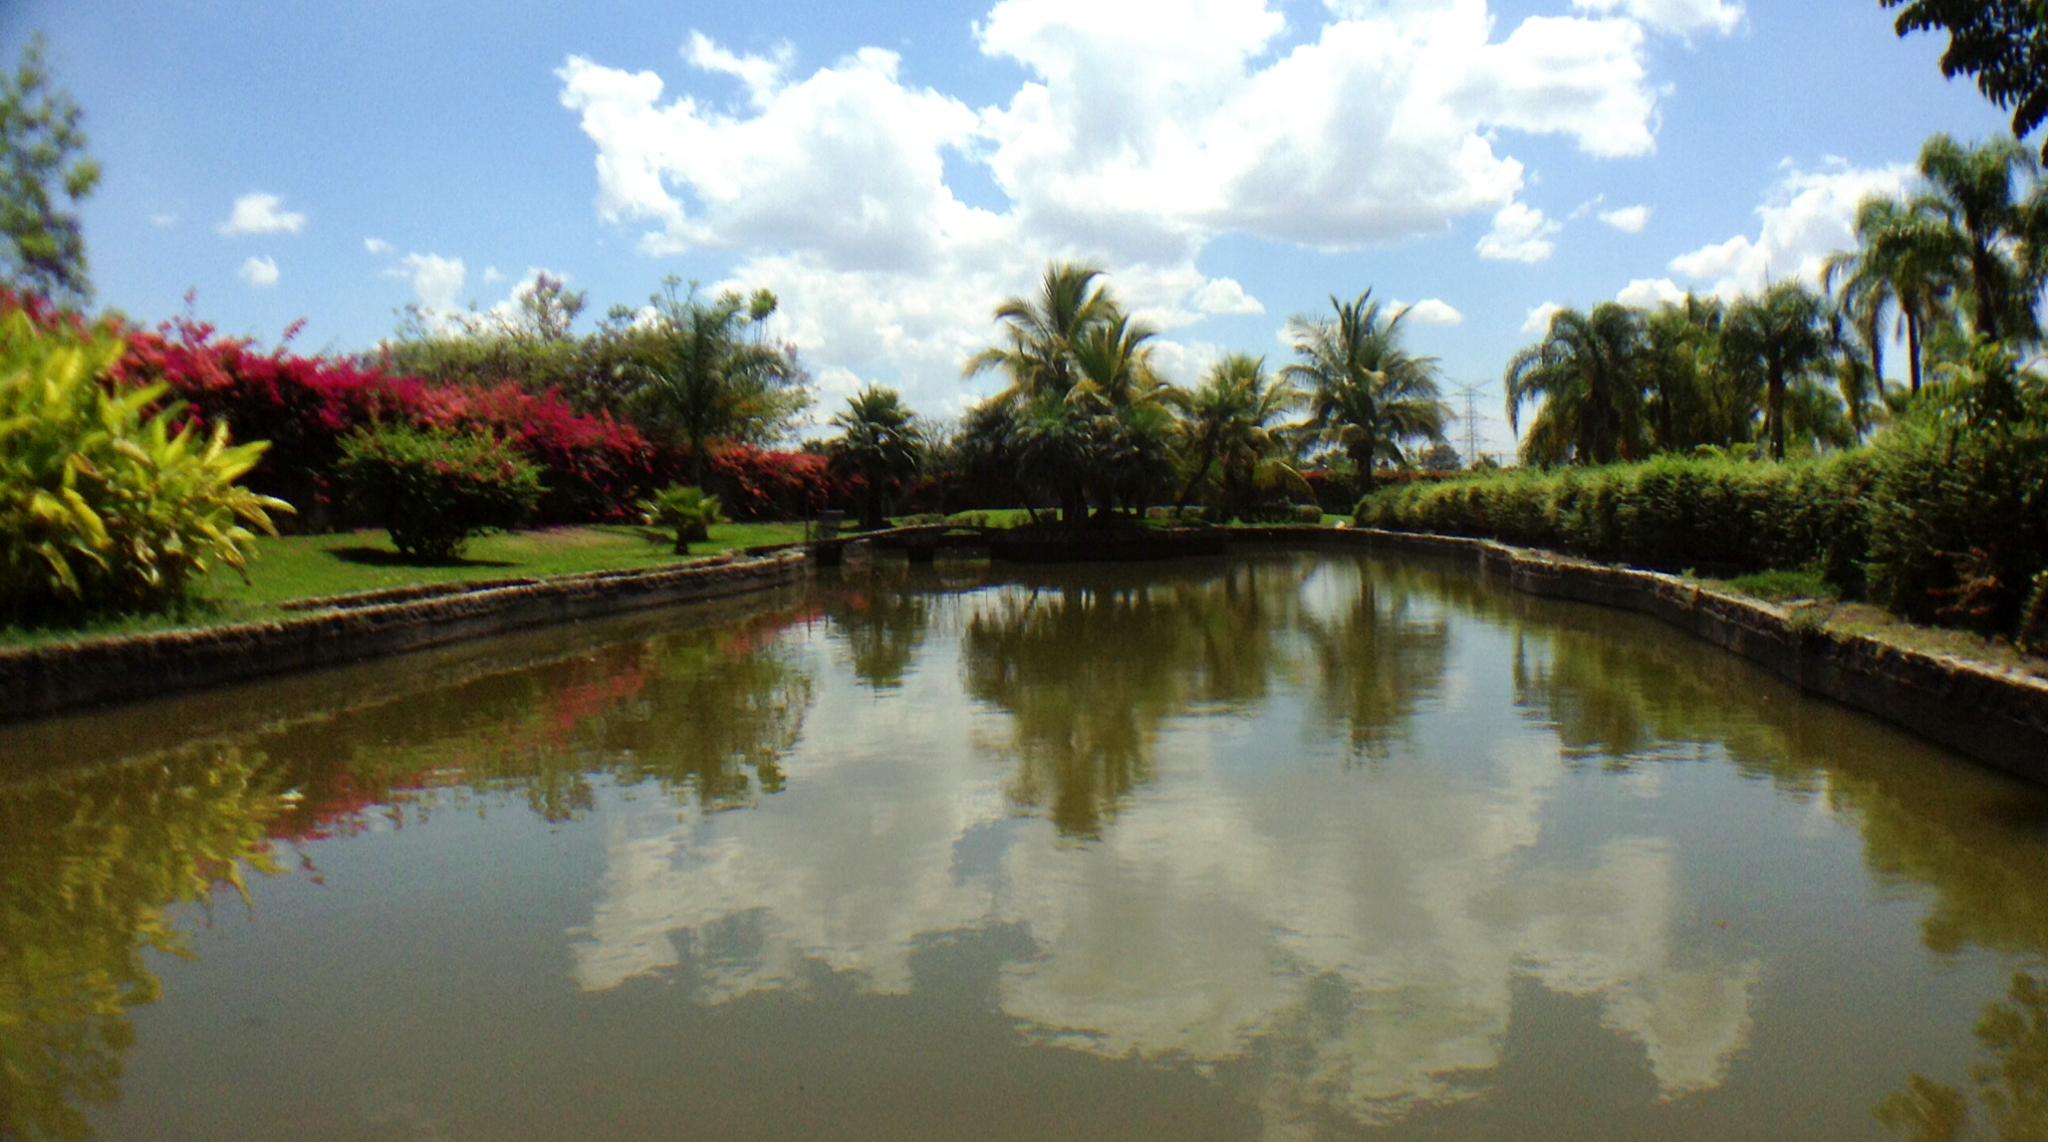 Lago villa toscana.jpg